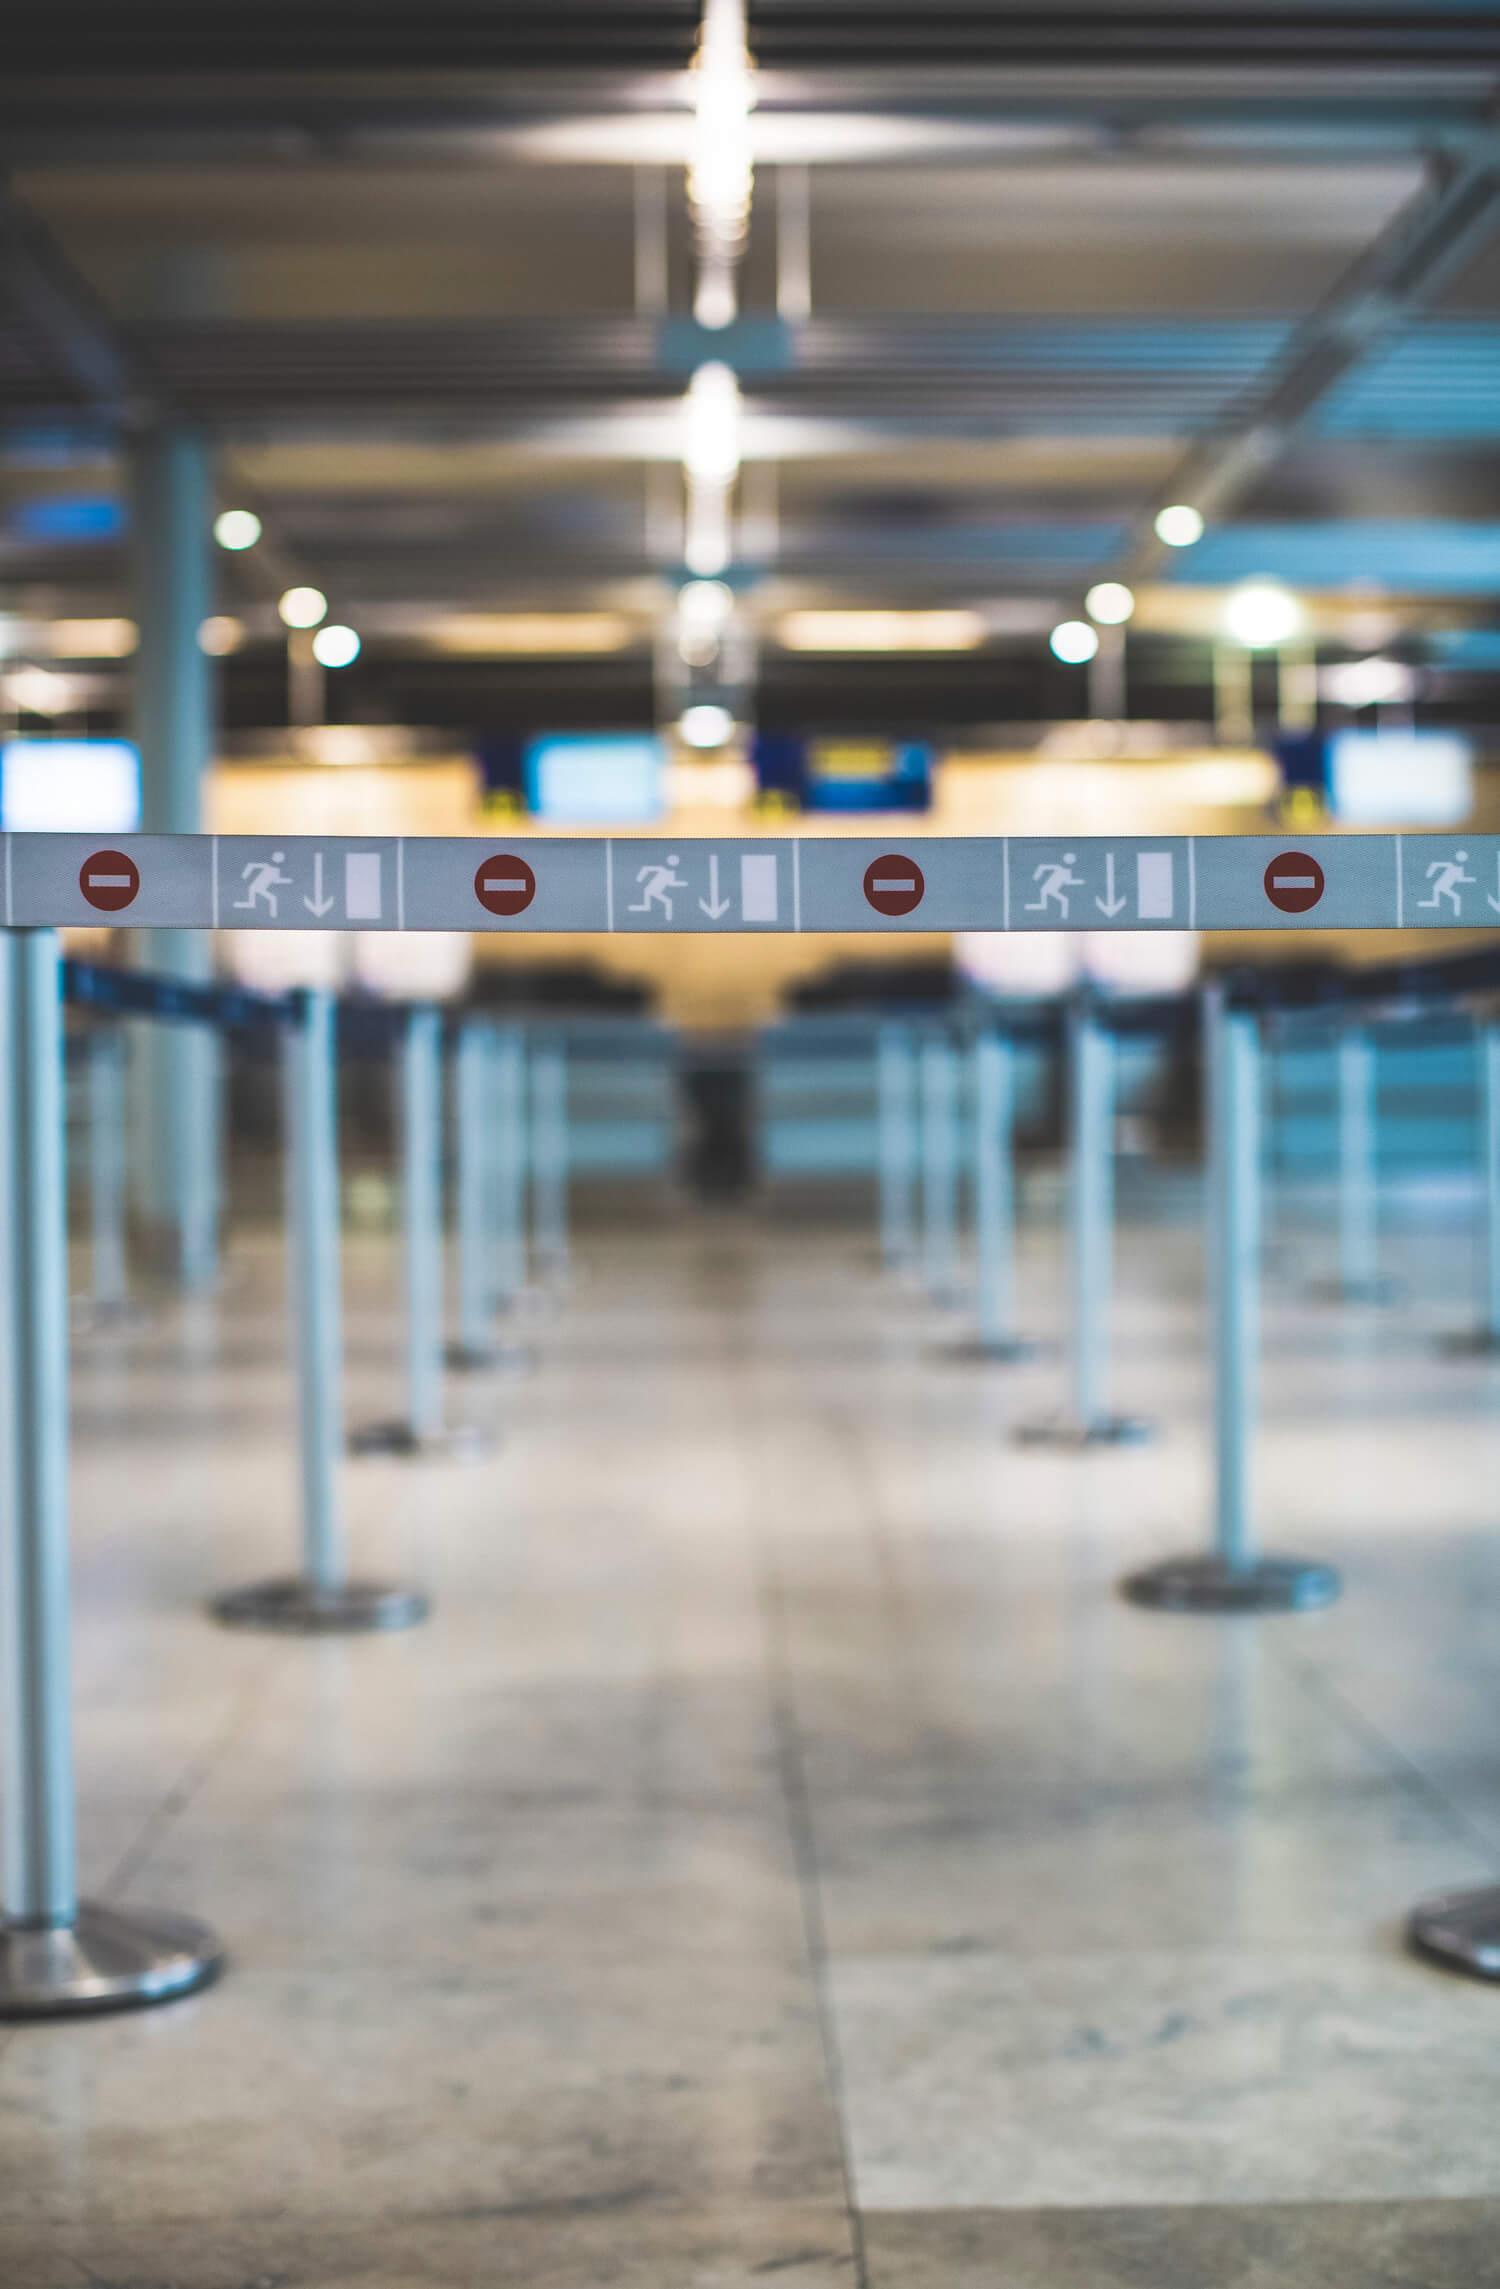 BBC: UK Shuts Travel Corridors Until 15 February